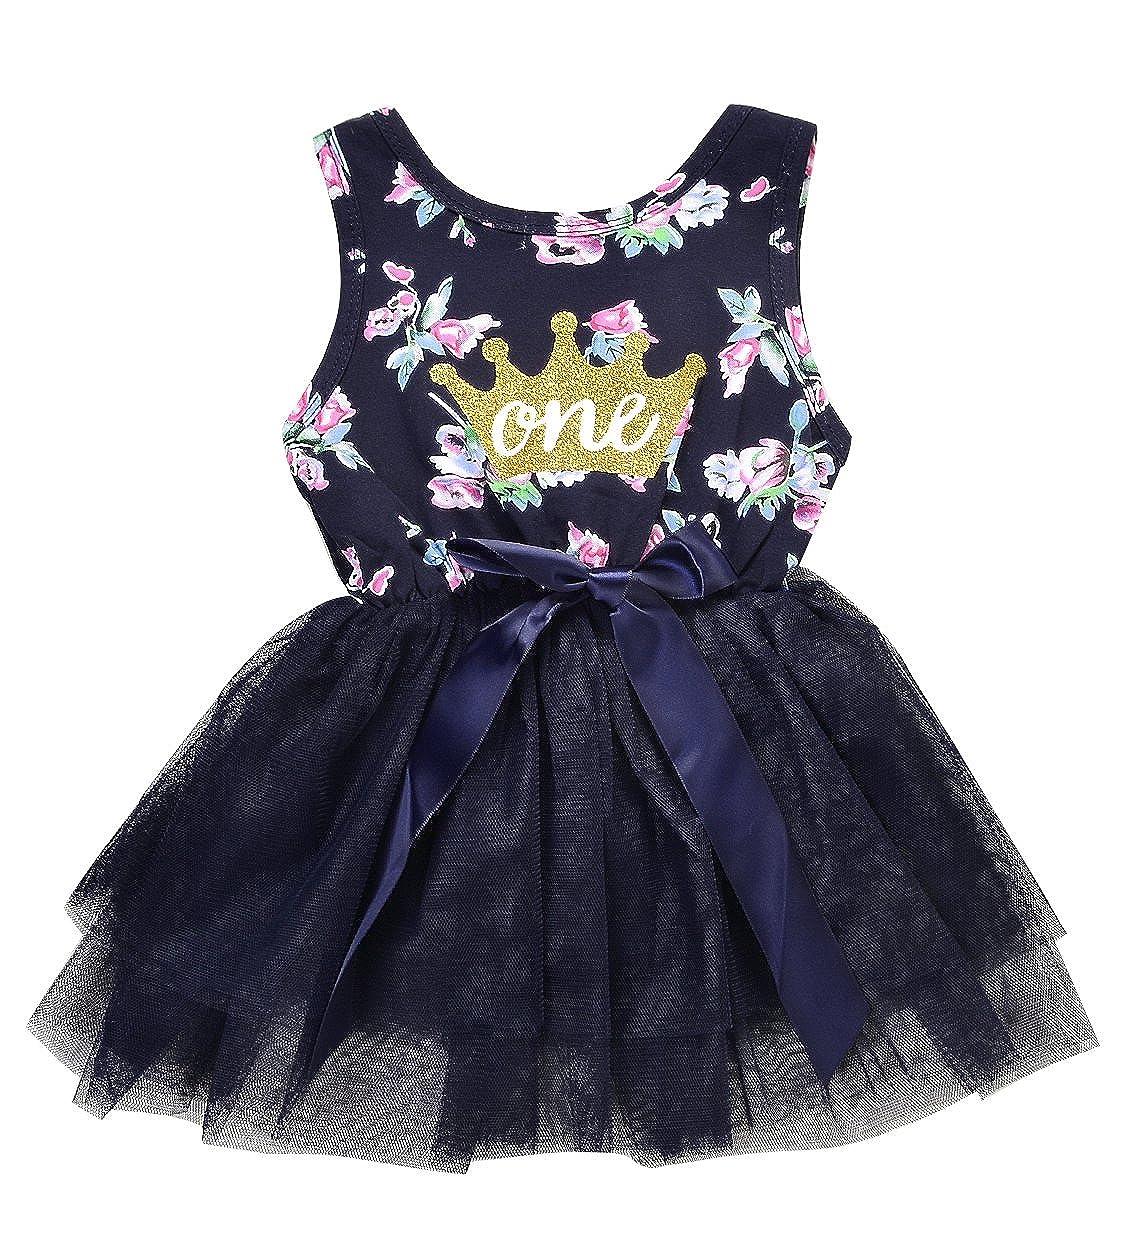 fca4c068 Size 80: Bust*2 26 cm, Dress Length 45 cm, For Age 3-6 Months Size 90:  Bust*2 27 cm, Dress Length 47 cm, For Age 6-12 Months